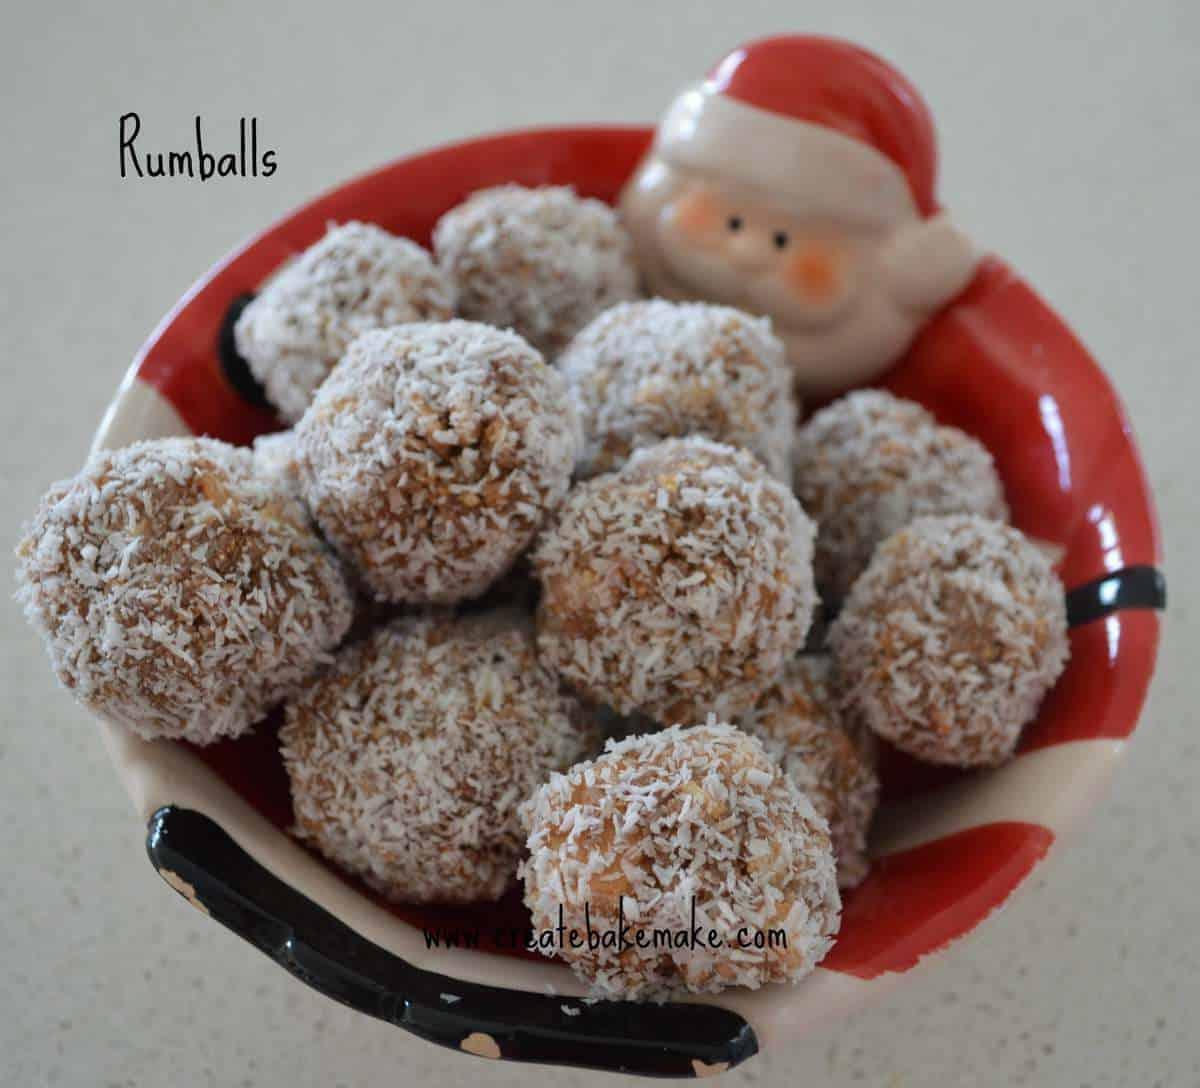 Christmas baking – Rum balls